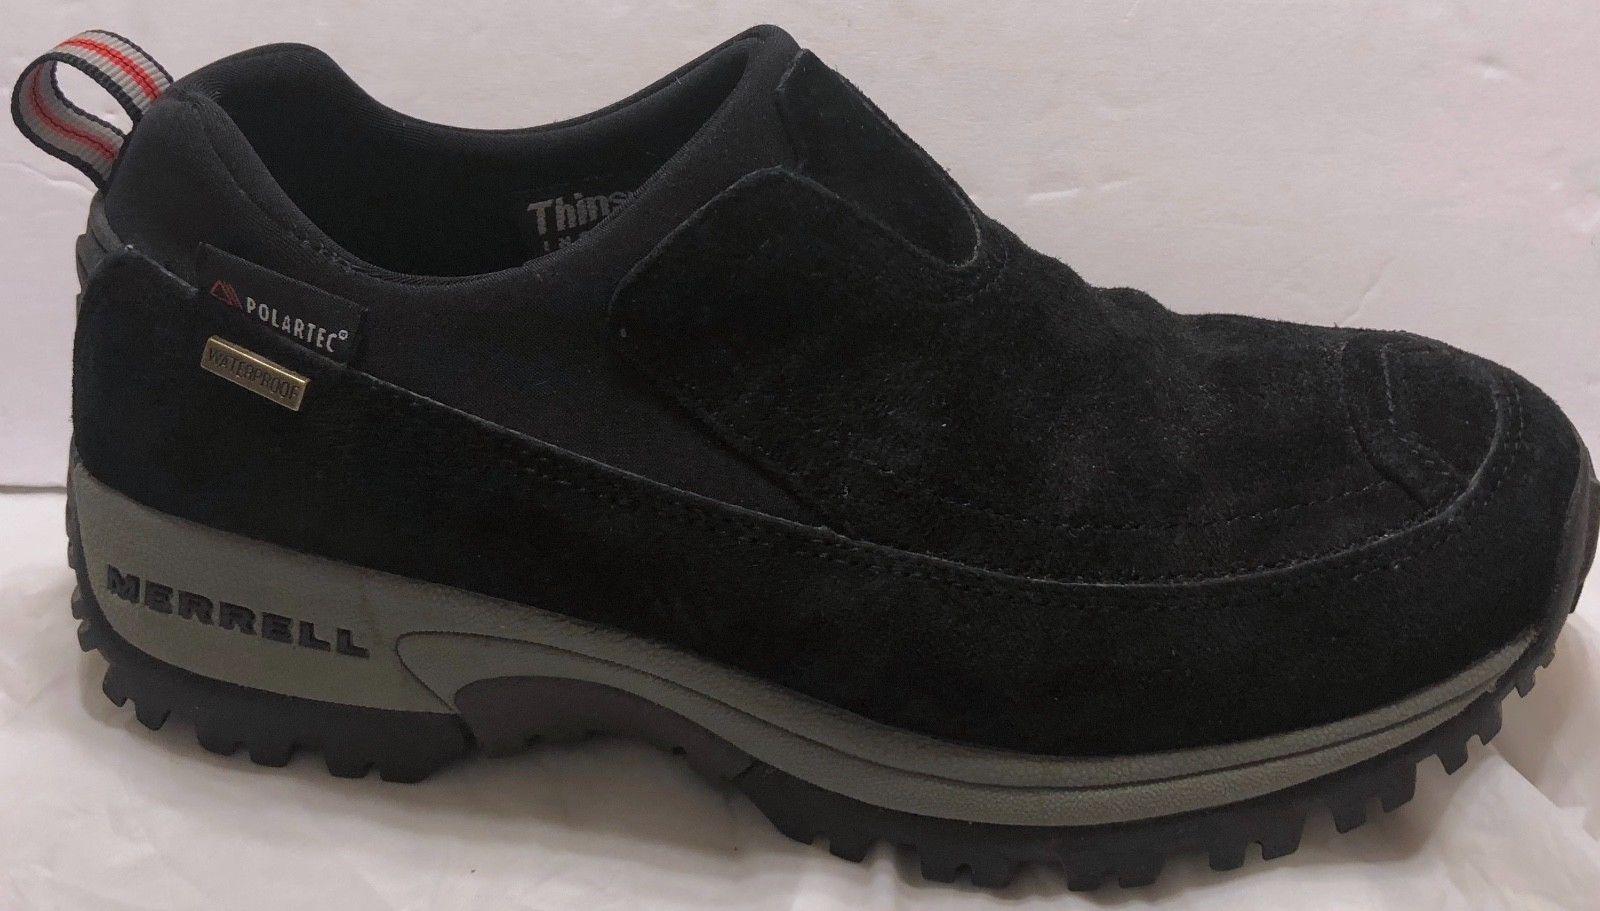 Merrell Polartec Waterproof Nubuck Moc Black Shoes Size 7 Slip On Hiking Trail